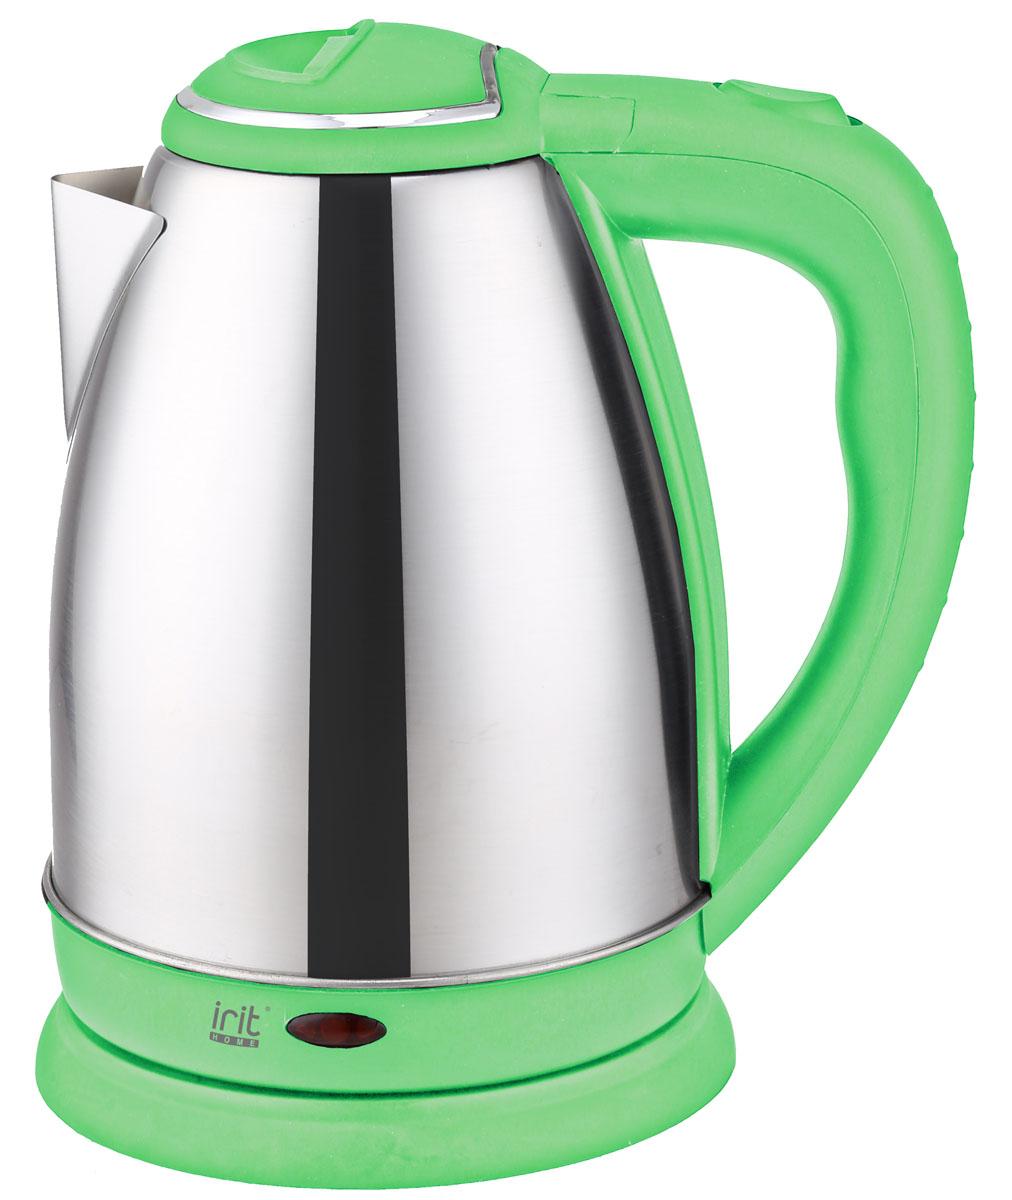 Irit IR-1337, Green электрический чайник электрический чайник irit ir 1314 silver red